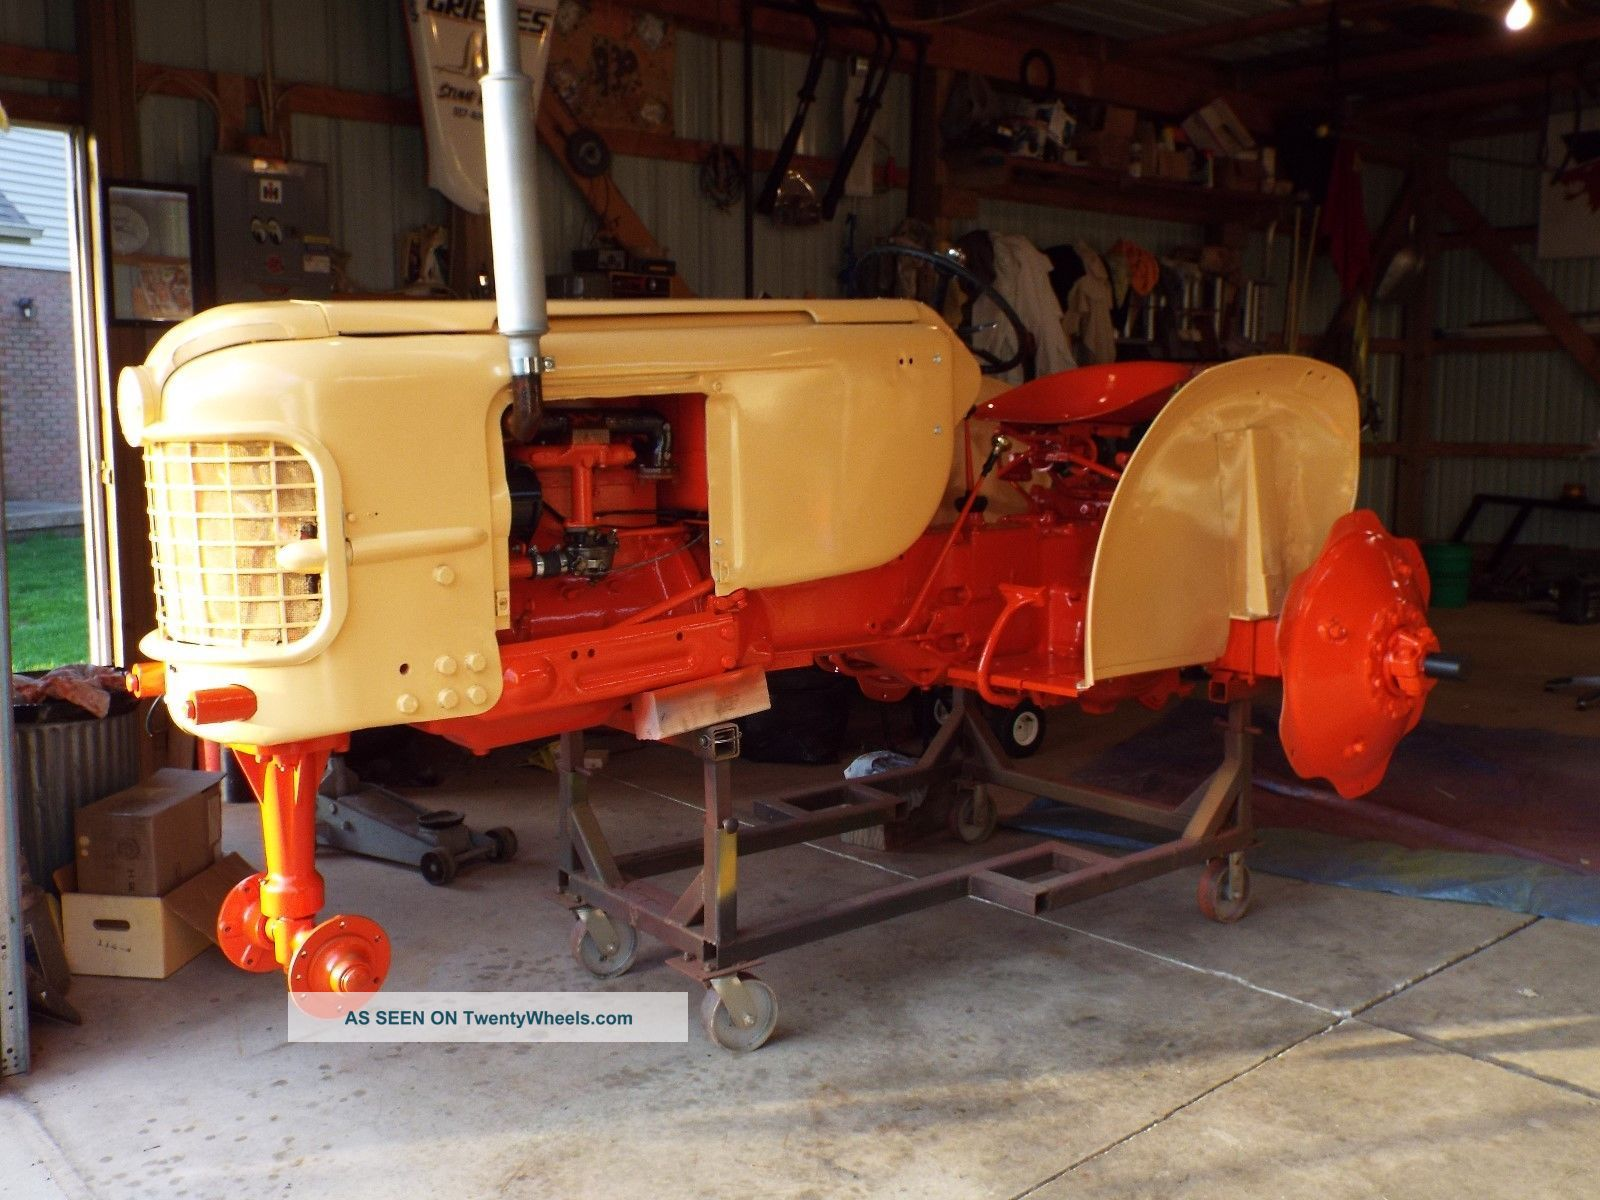 1956 Case Tractor : Case tractor model